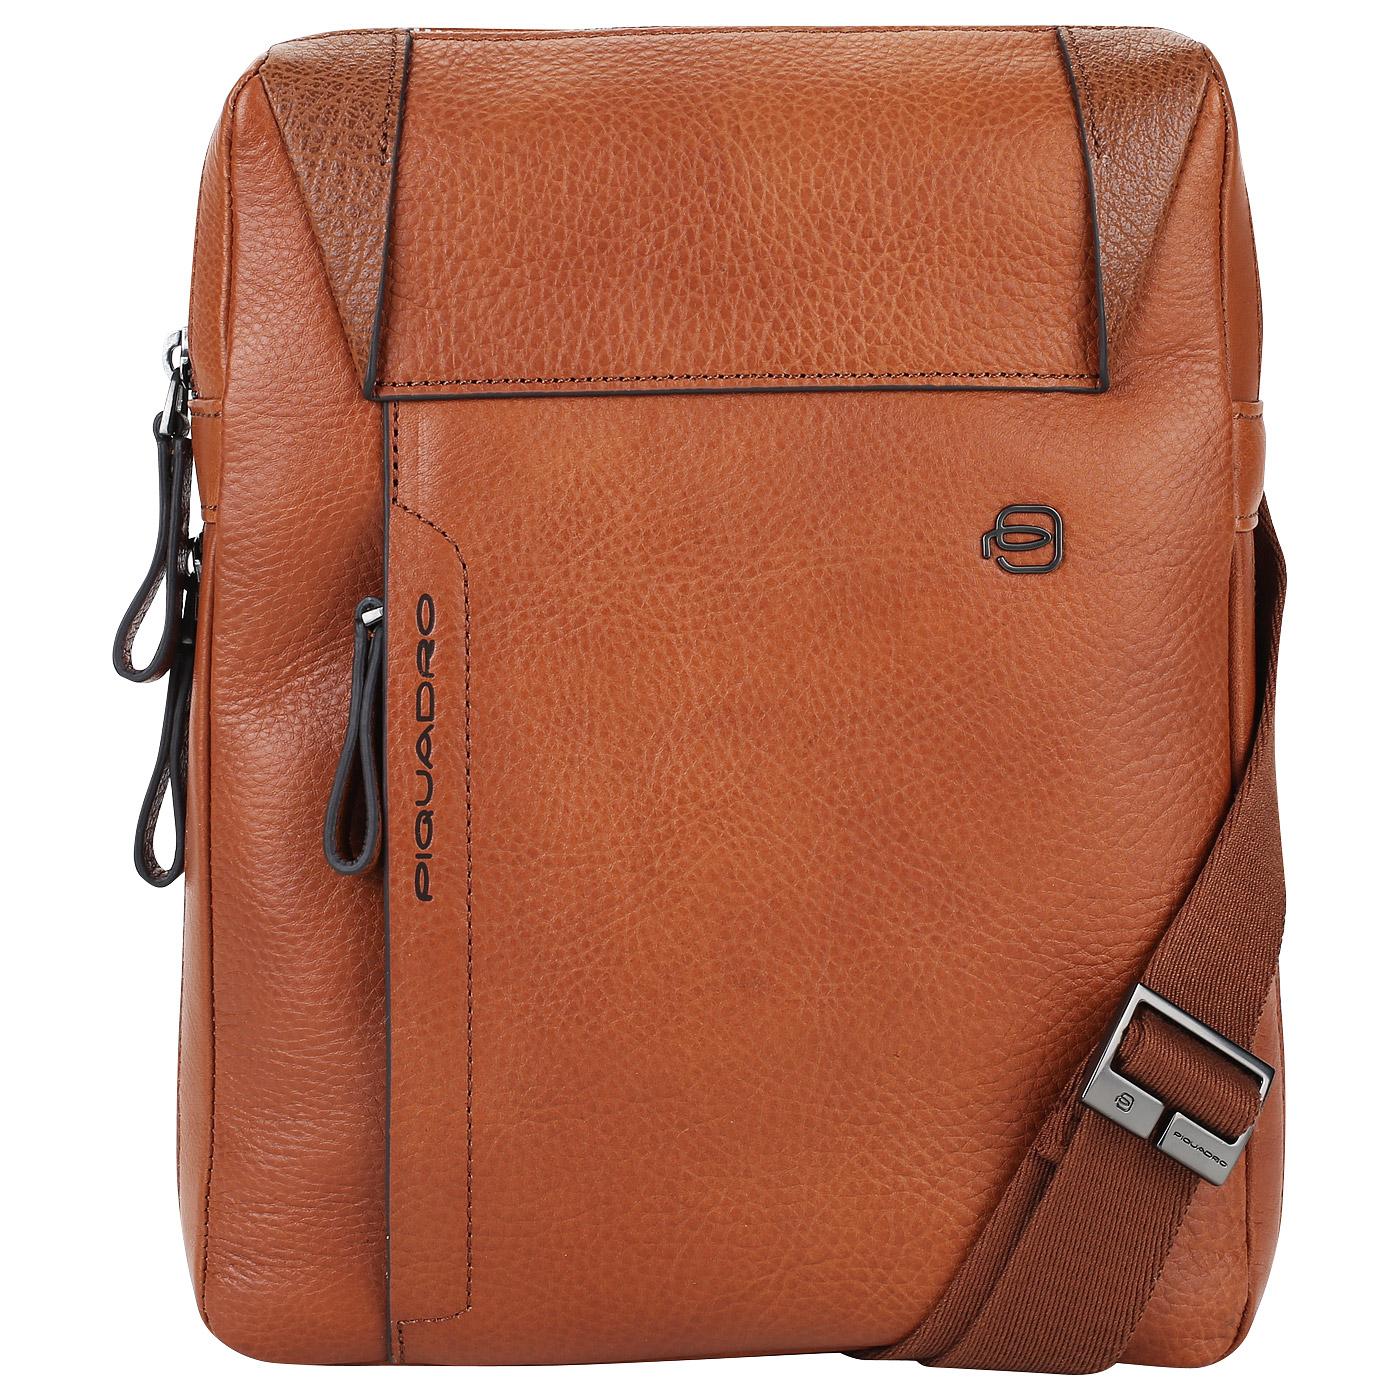 7f81c02d1e9b Мужская сумка-планшет из кожи Piquadro Pan CA4306S94/CU ...